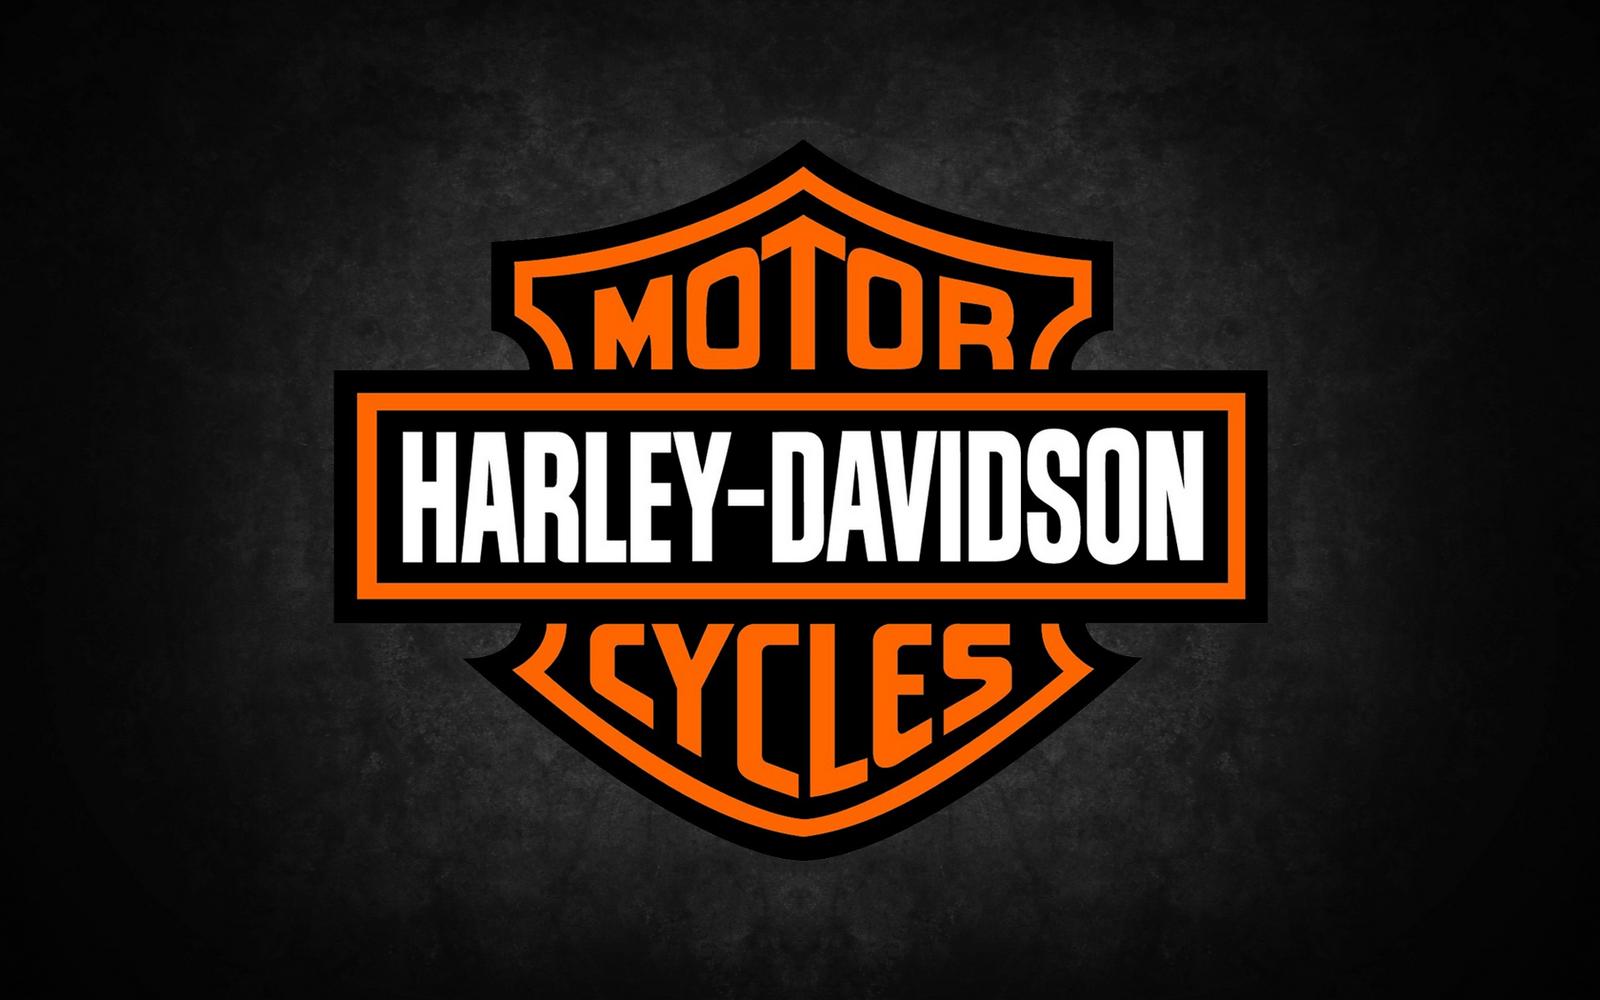 Harley Davidson Logo Wallpaper 1600x1000